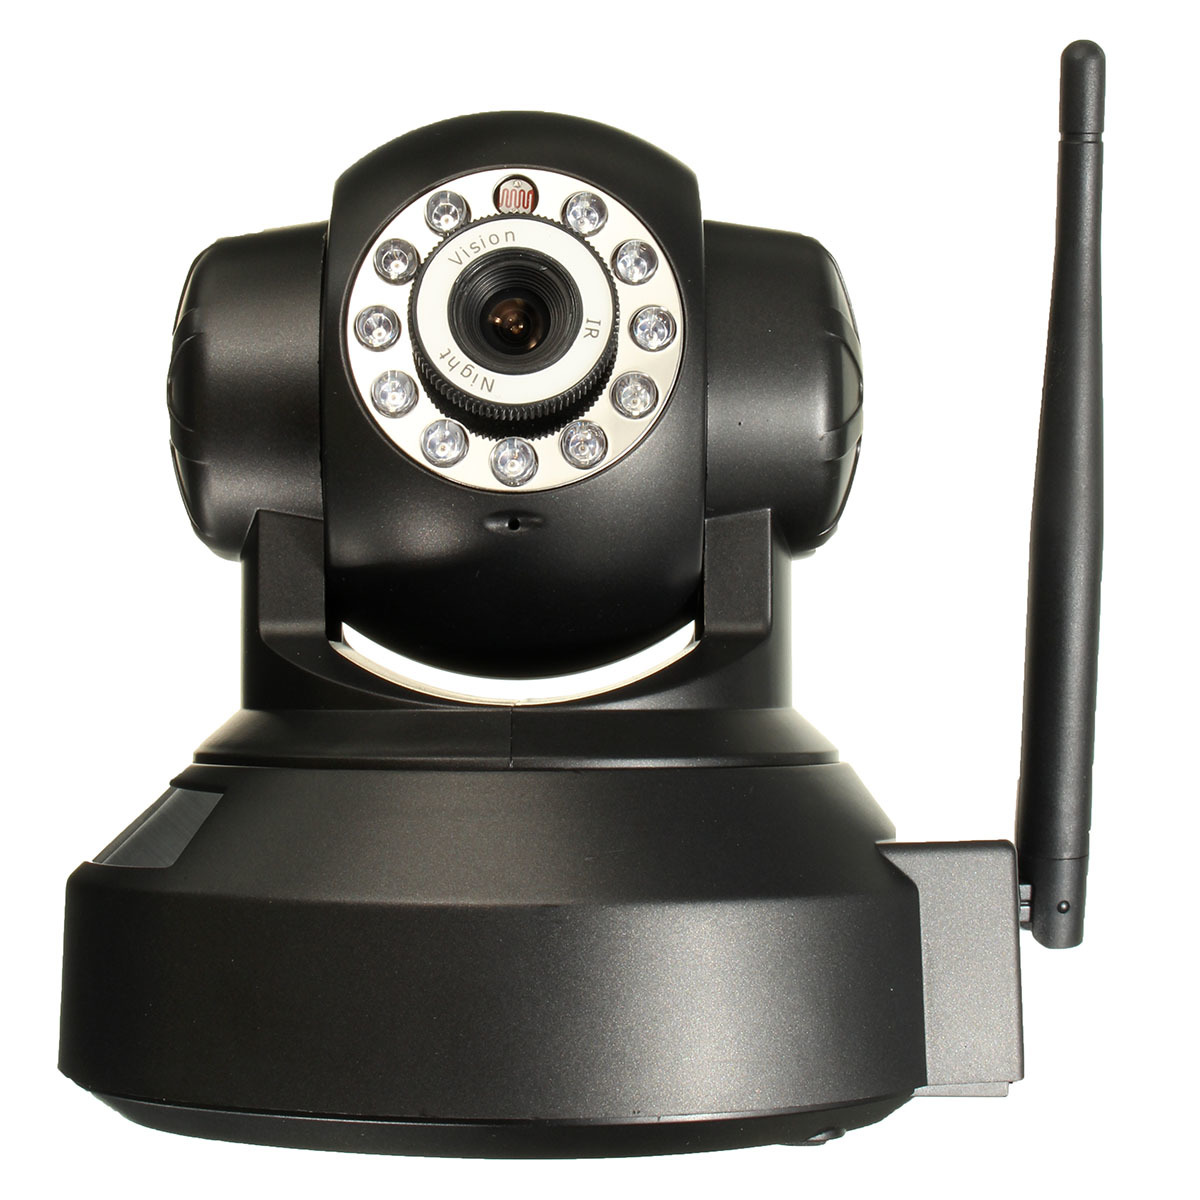 WiFi font b Camera b font font b Door b font Security Cam Wireless Baby Monitor